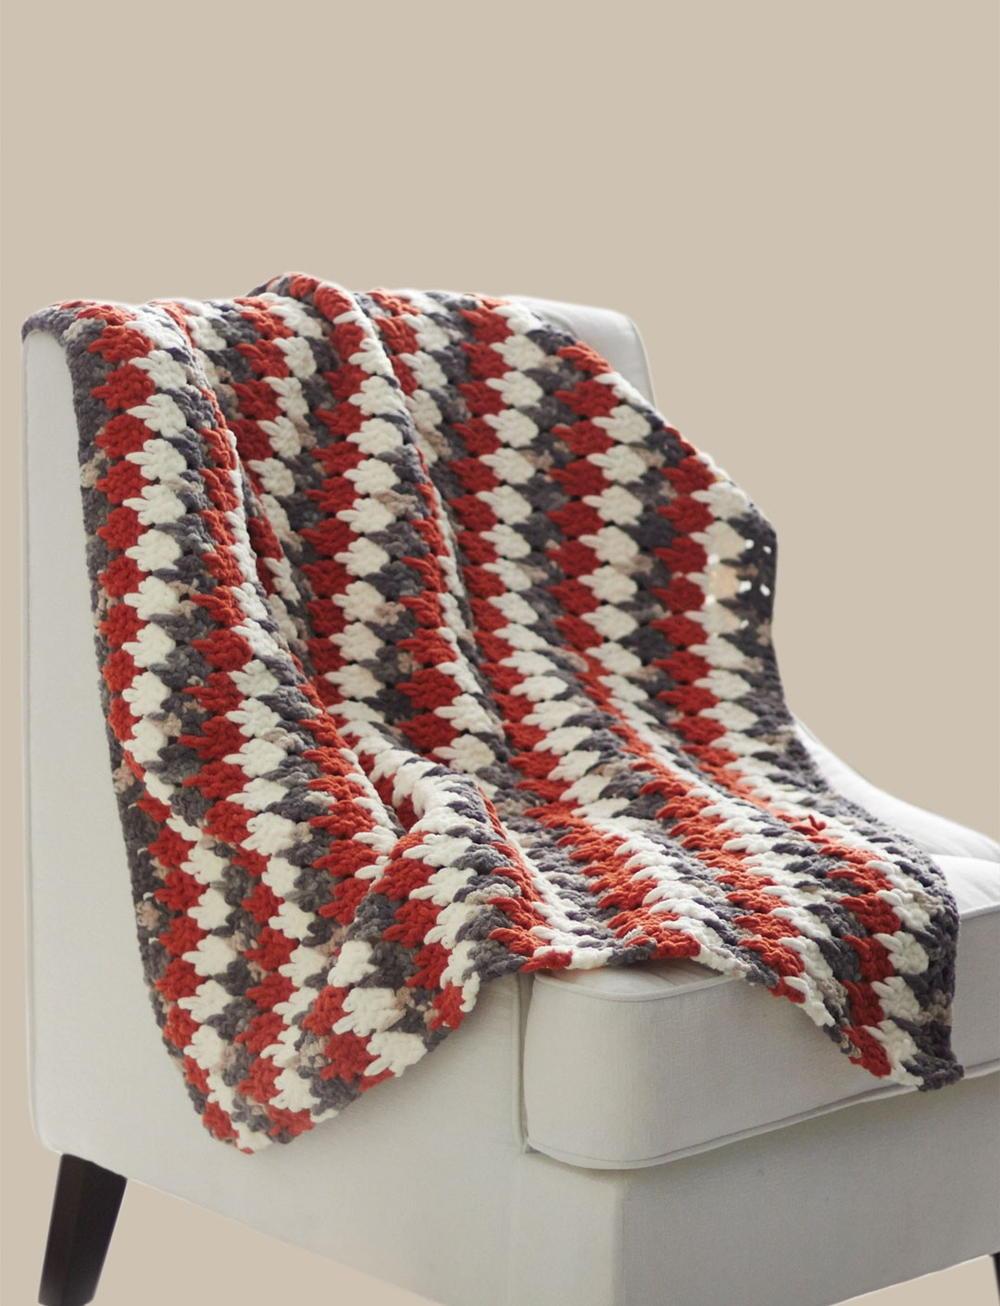 Crochet Afghan Patterns Bulky Yarn : Larksfoot Crochet Blanket AllFreeCrochet.com